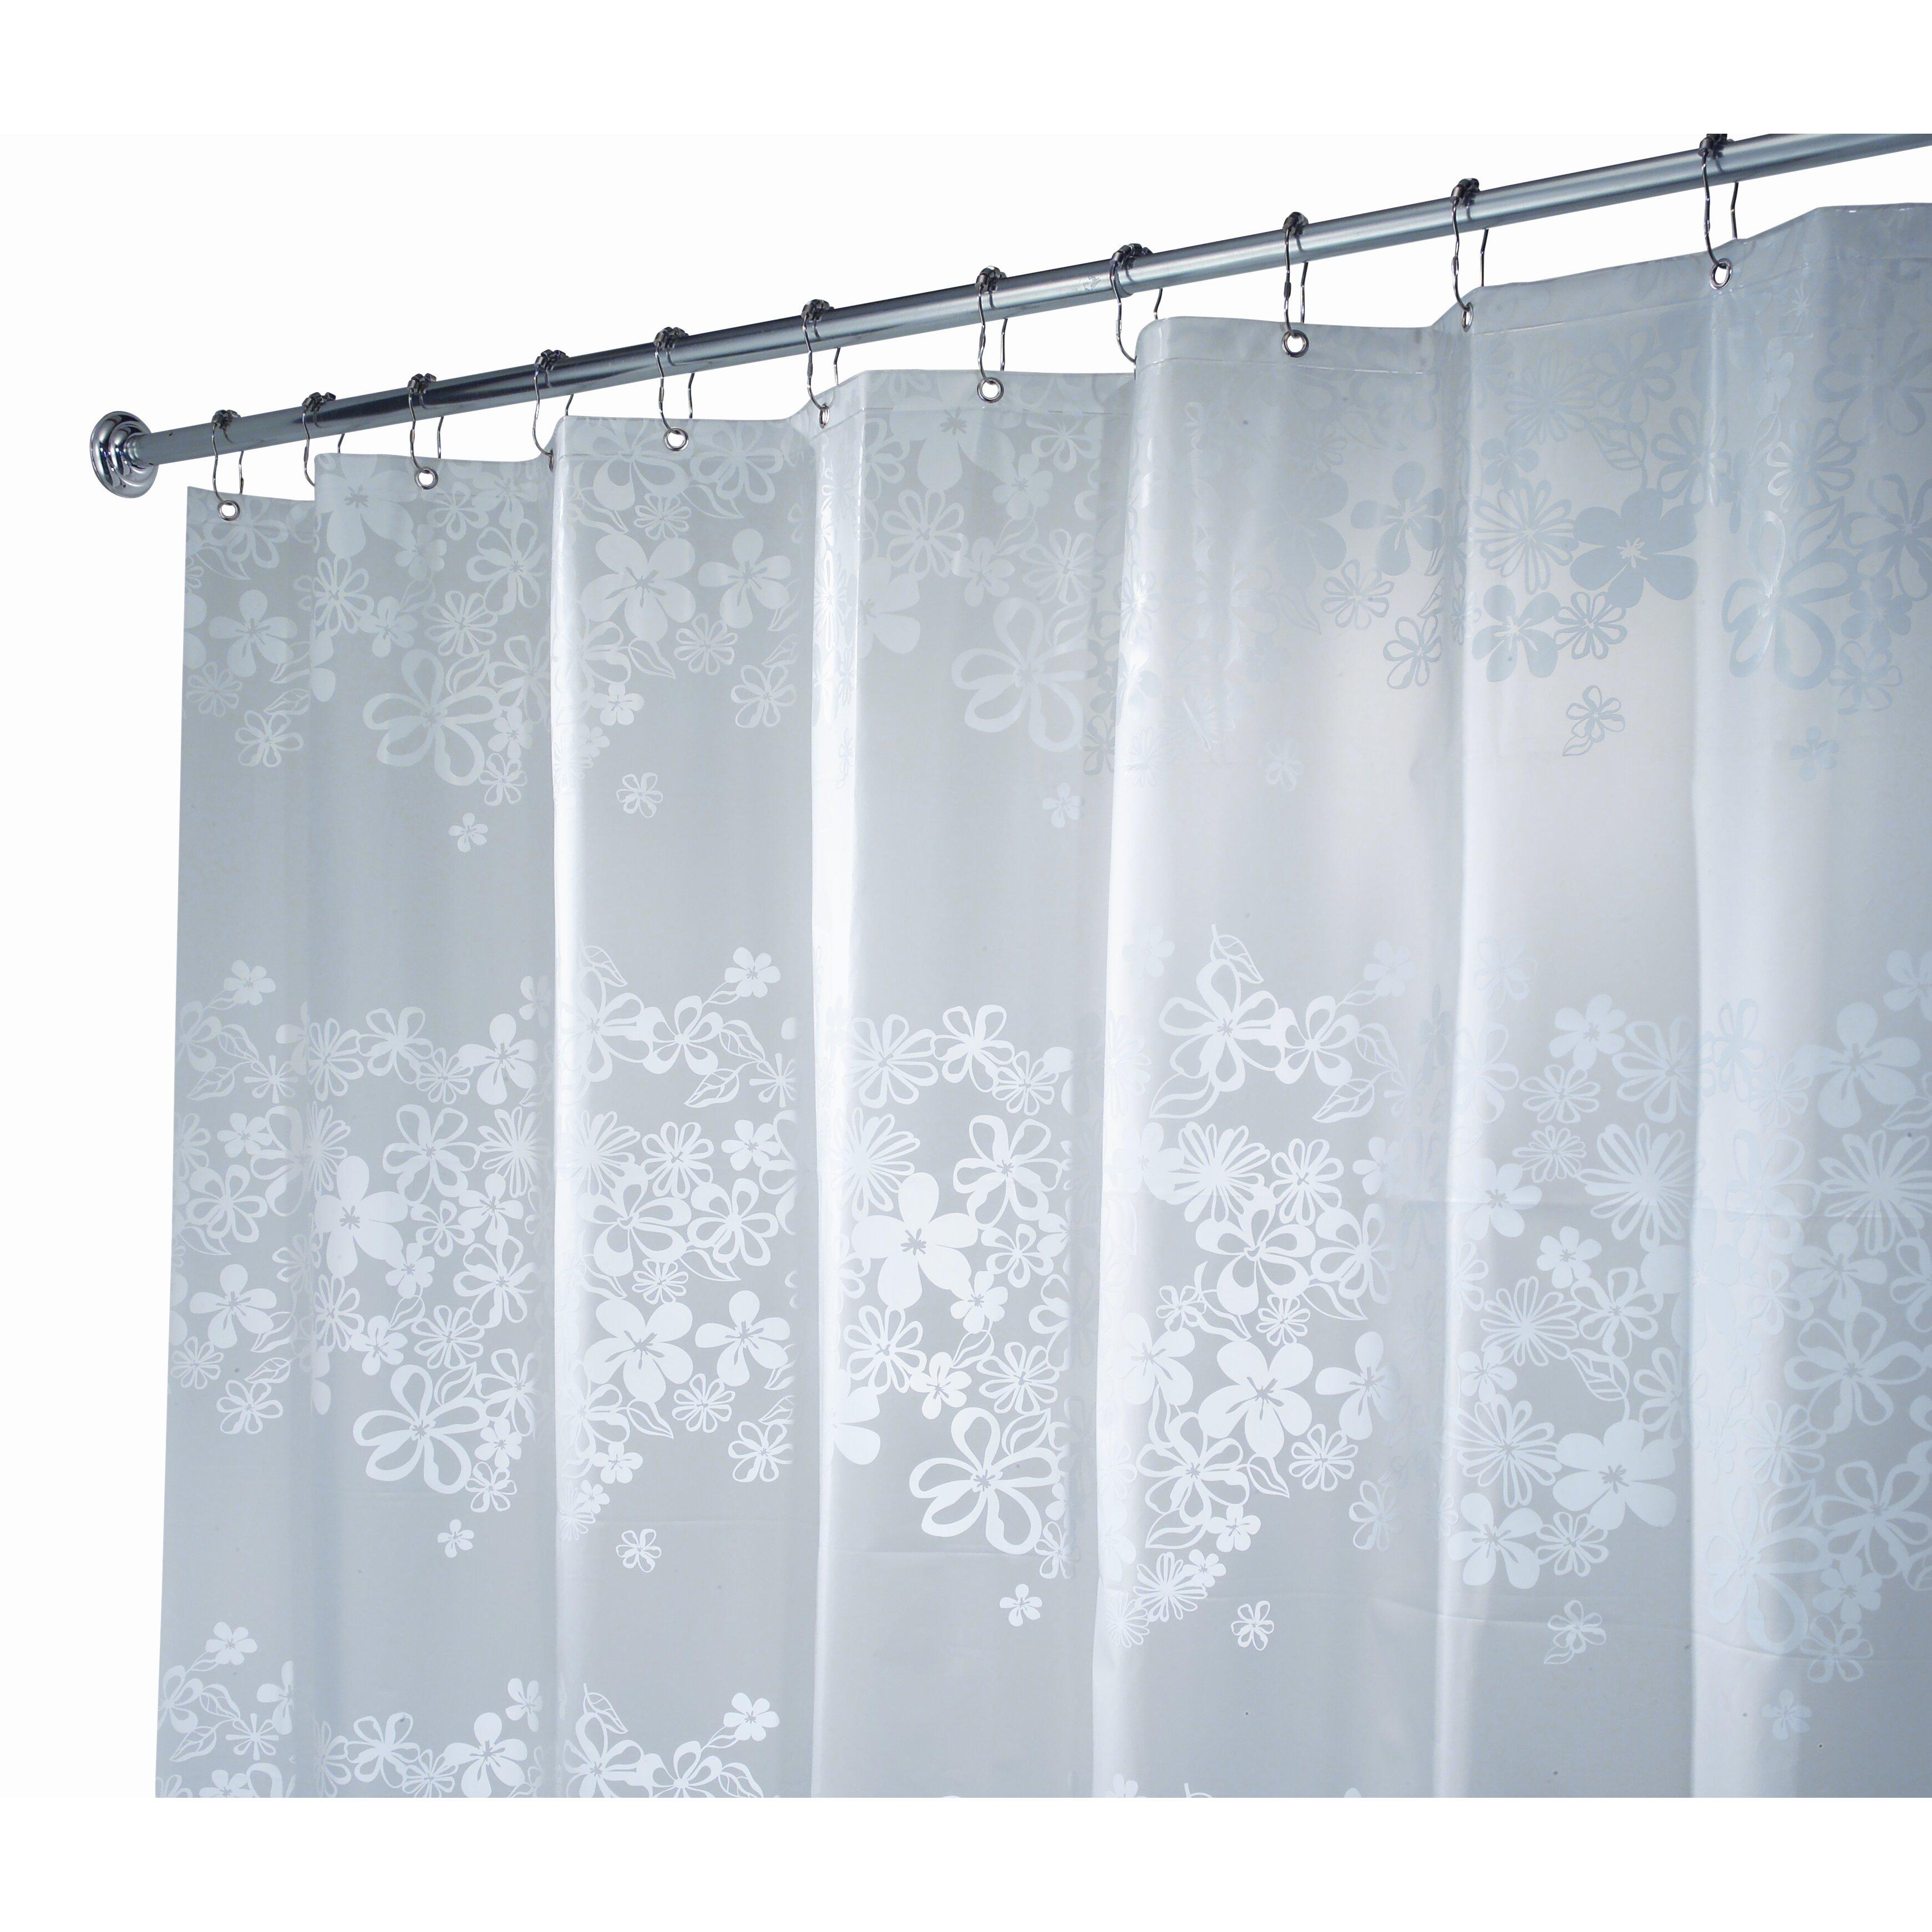 Interdesign eva vinyl shower curtain reviews wayfair for Vinyl window designs complaints